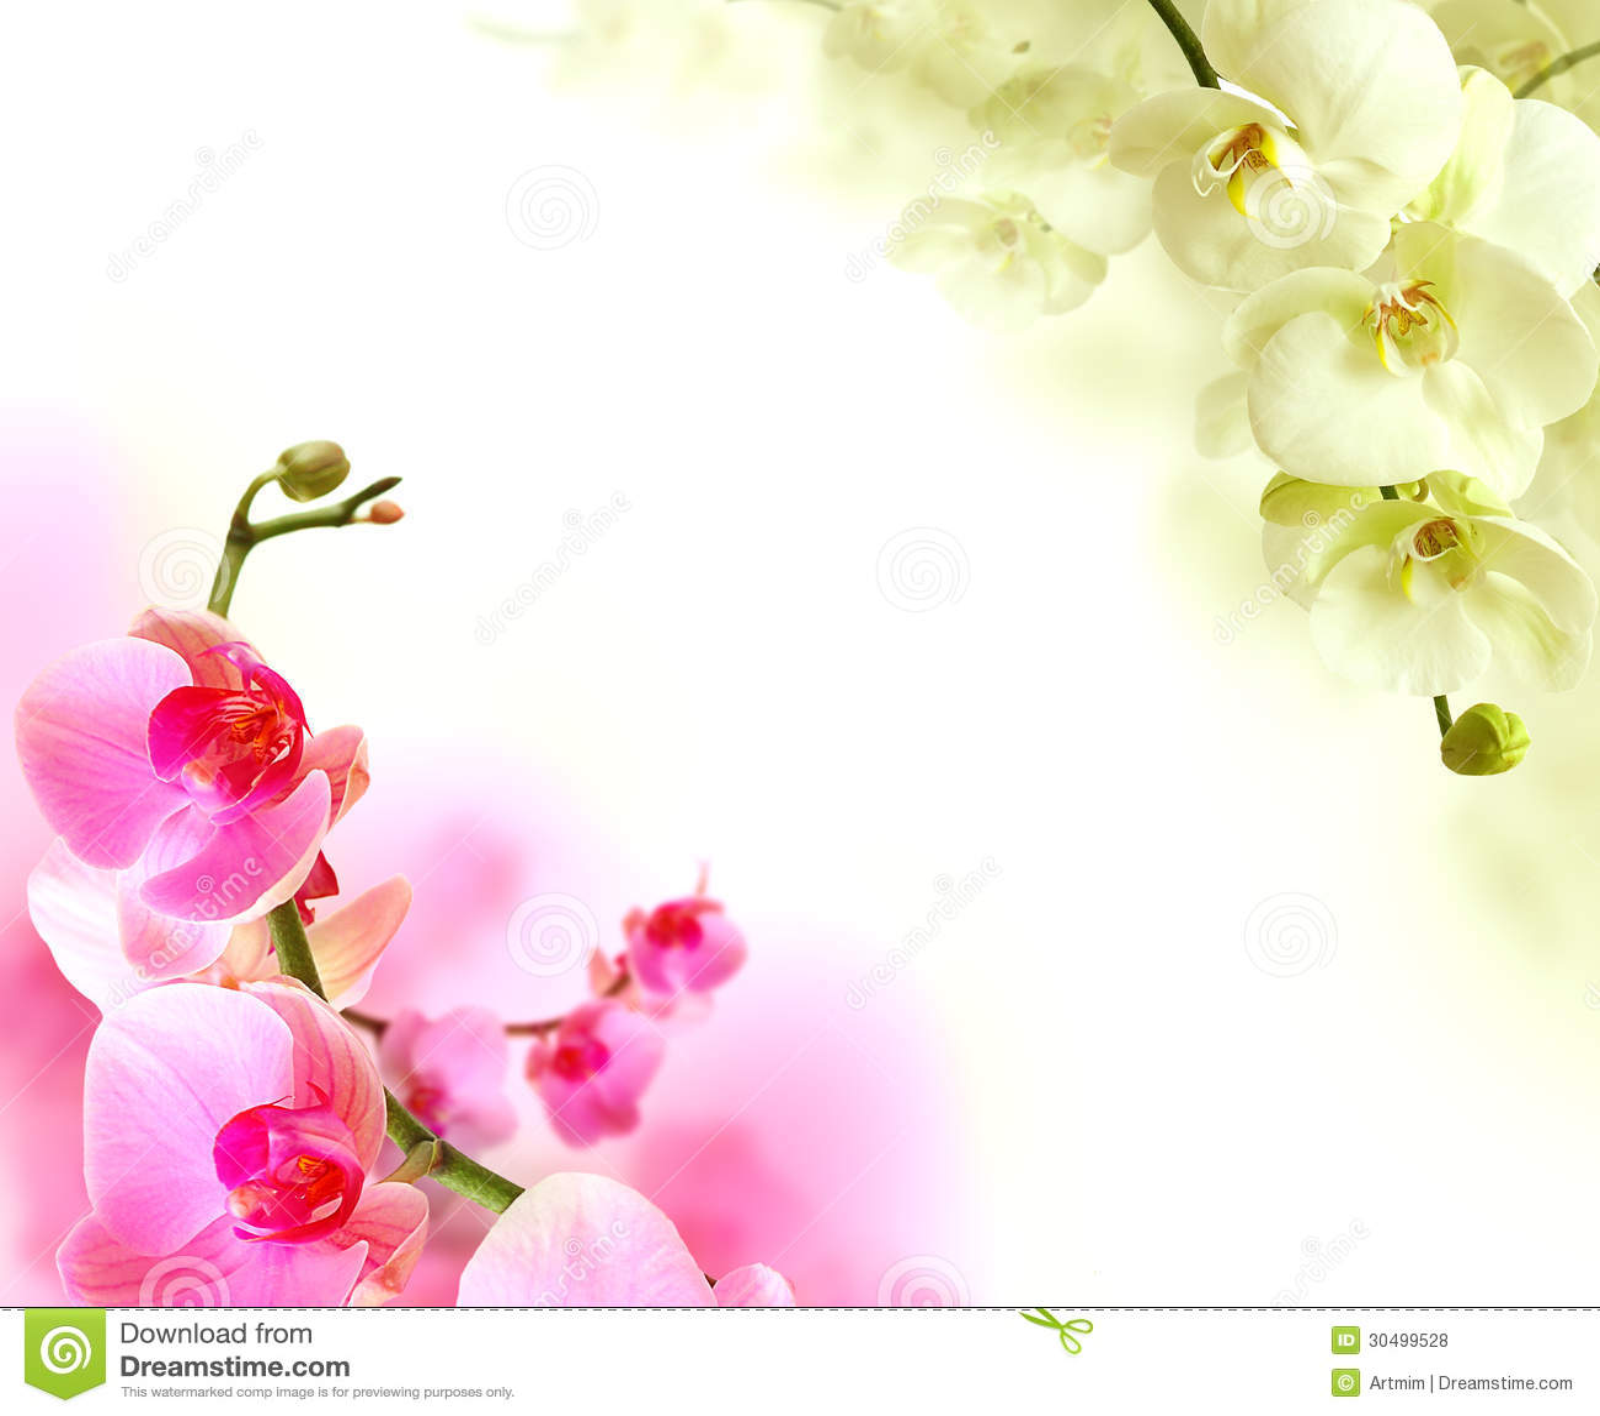 Flower Images Stock Photos amp Vectors  Shutterstock